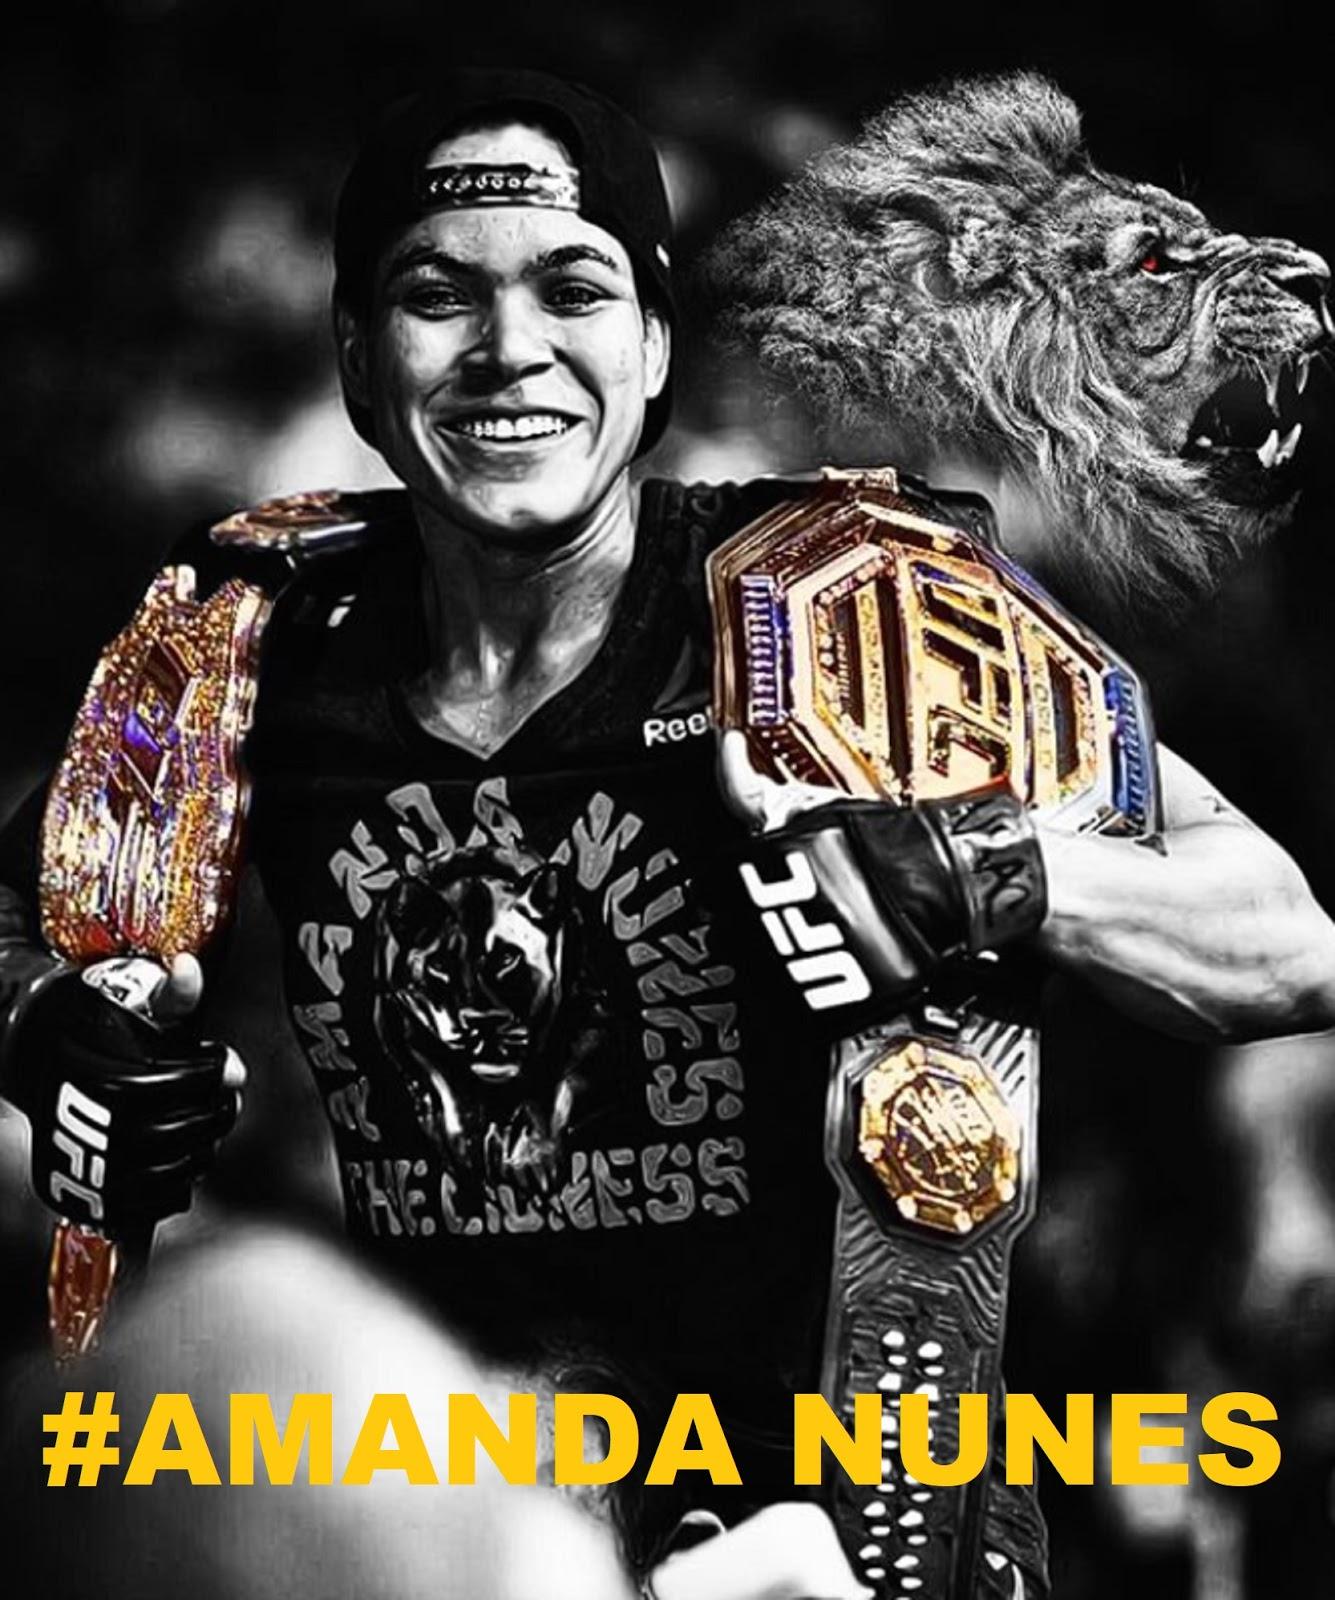 AMANDA NUNES 2